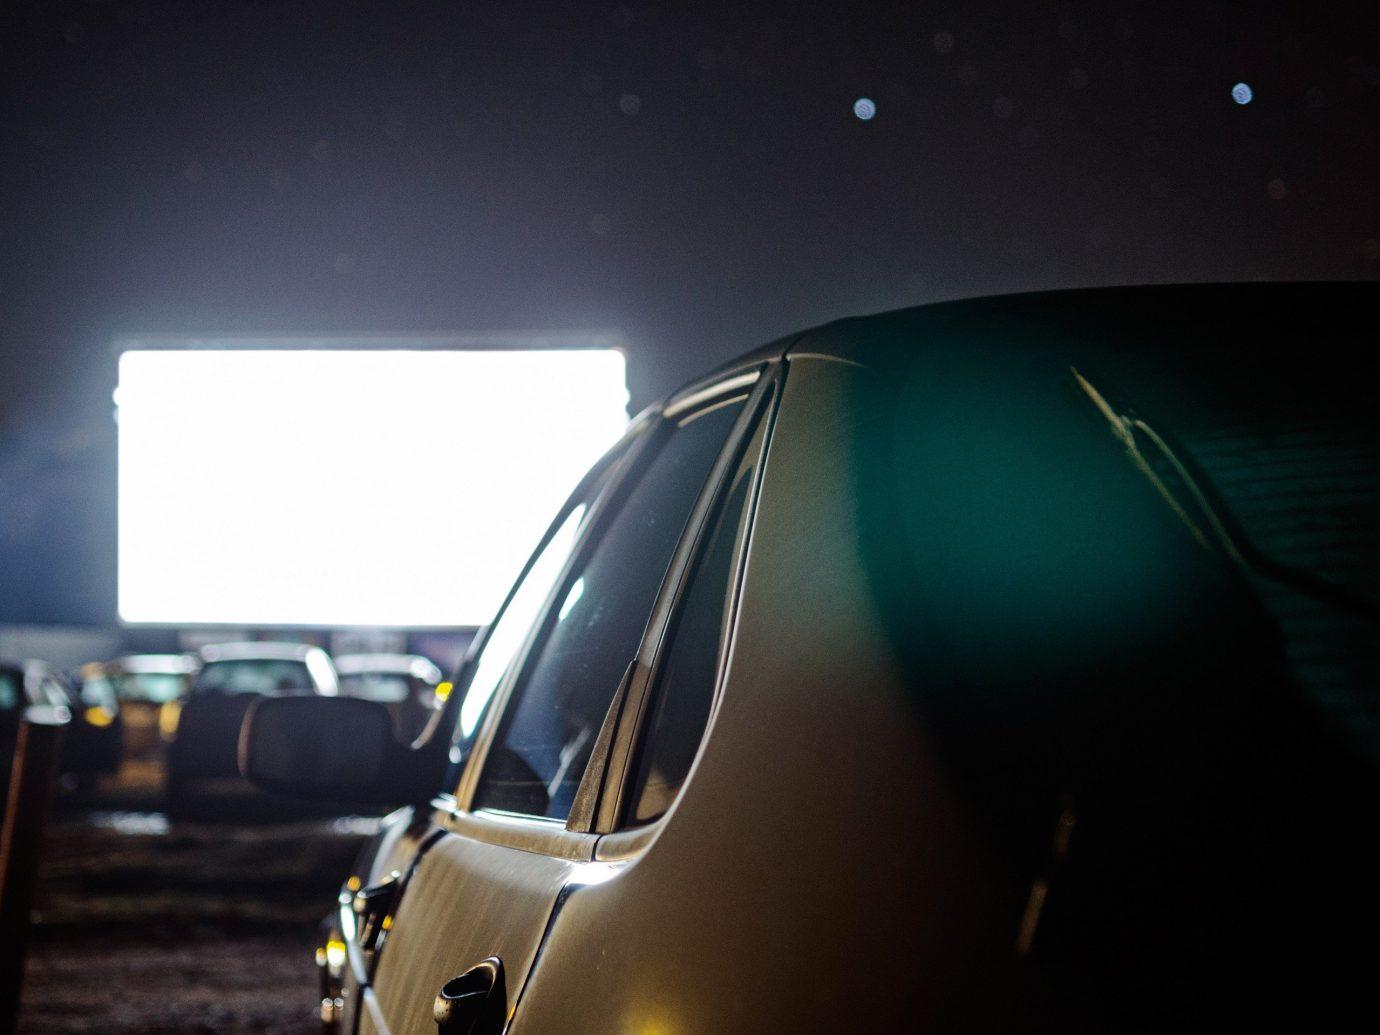 Offbeat light night darkness vehicle atmosphere of earth screenshot dark